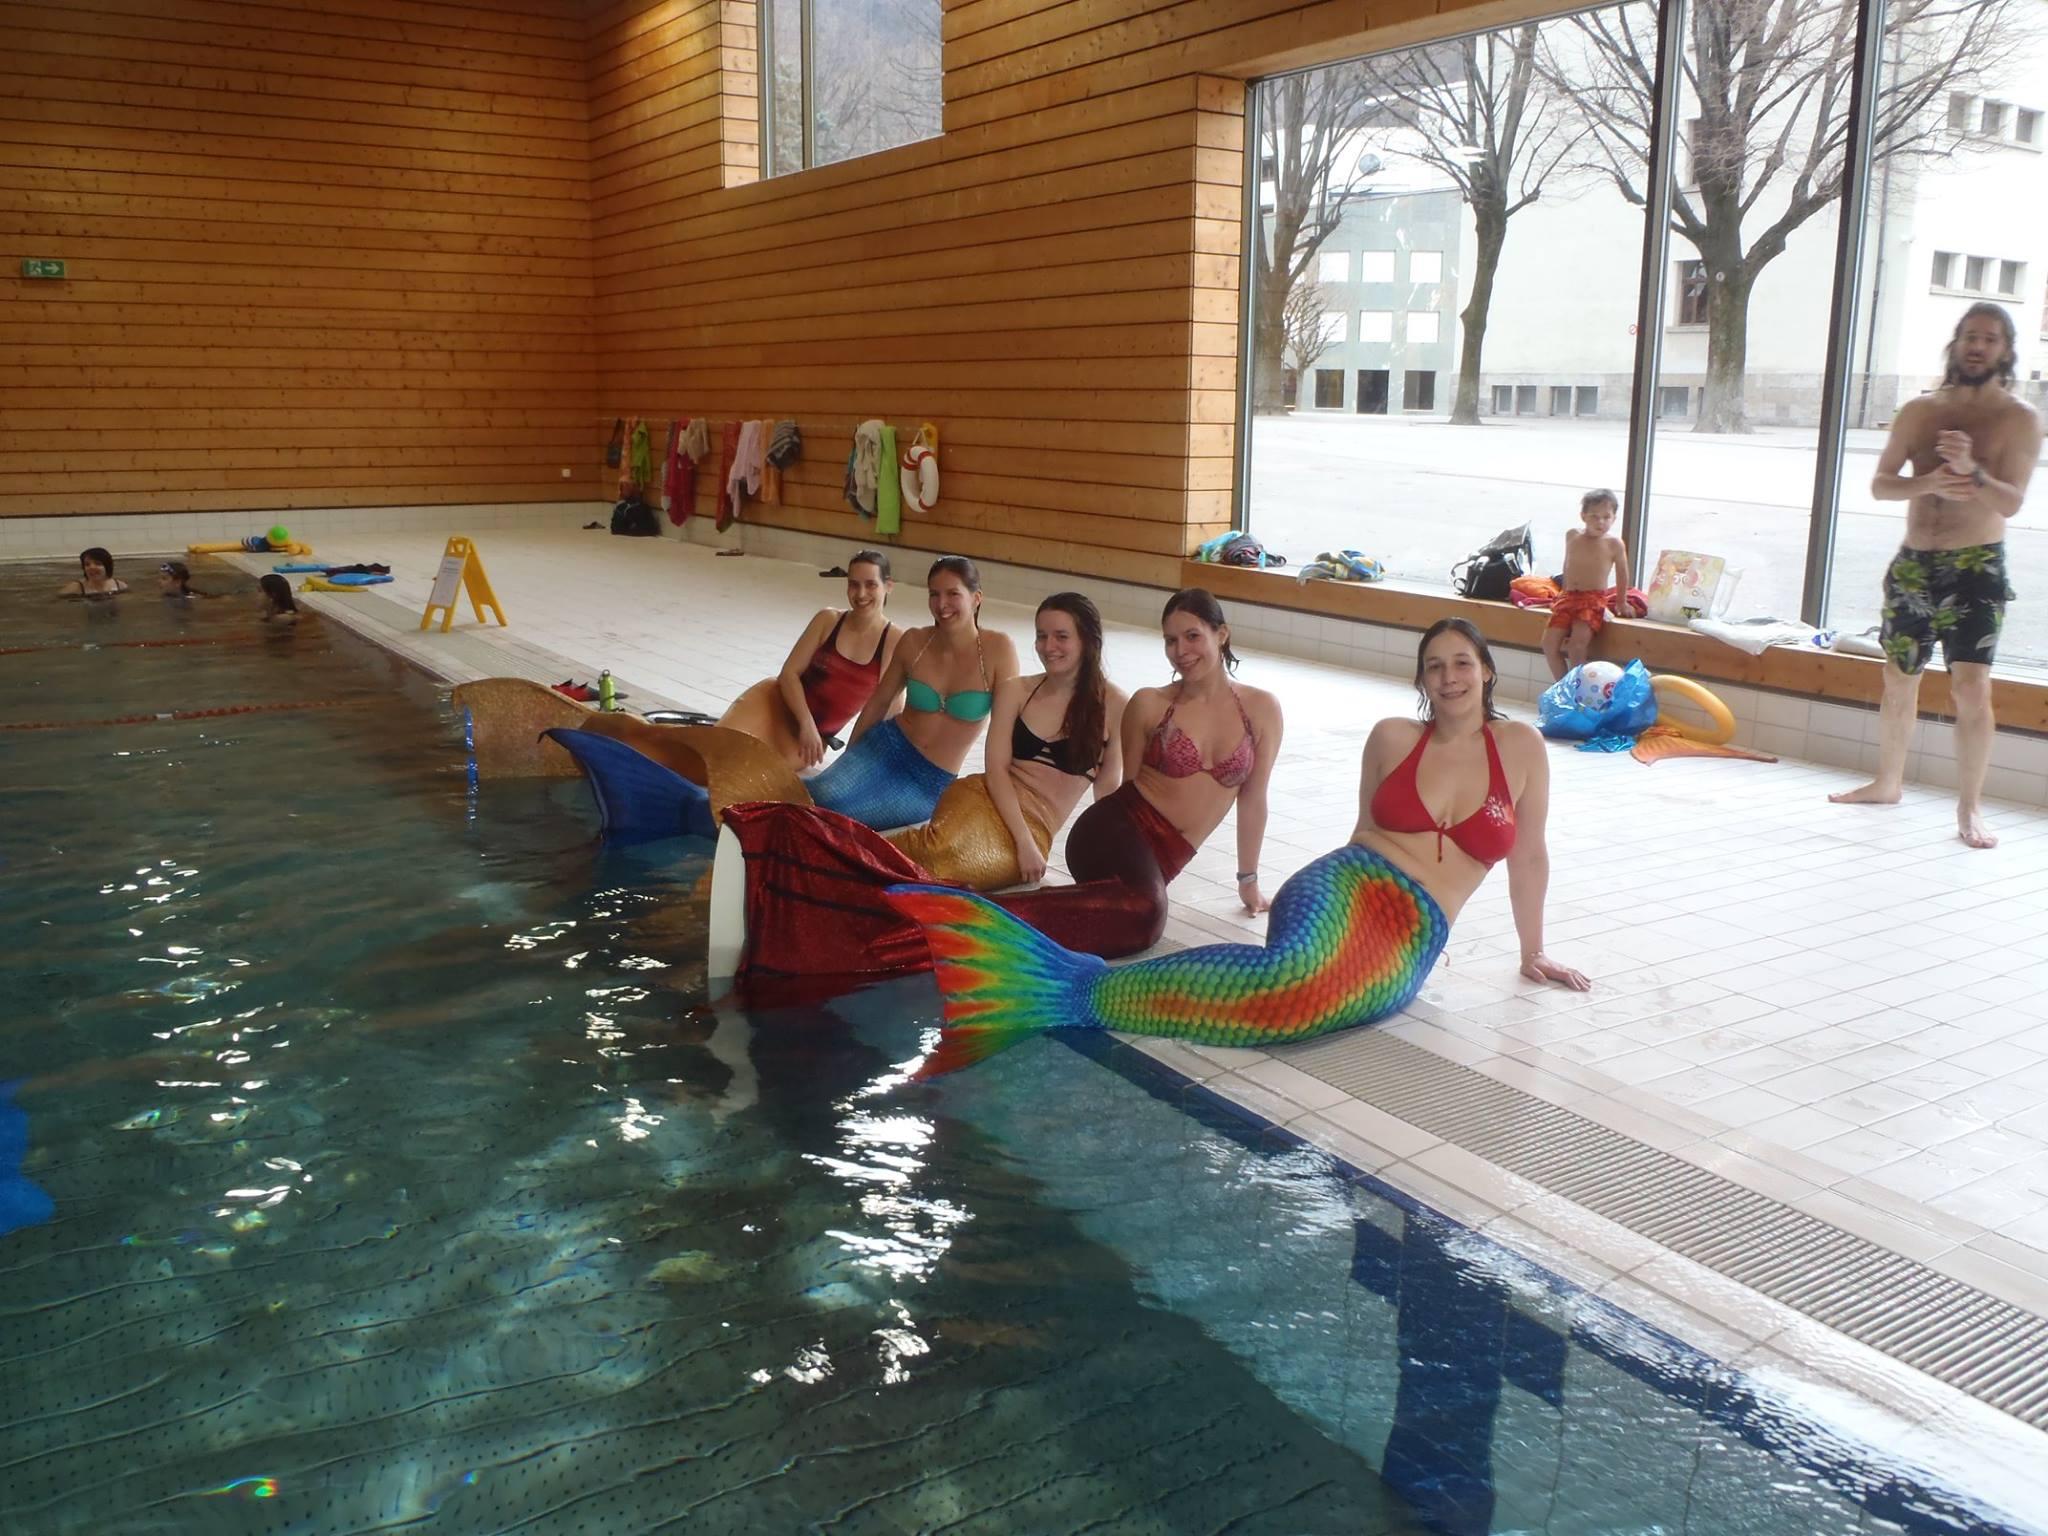 Journ e d initiation au mermaiding m tisph re swiss mermaid for Journee piscine